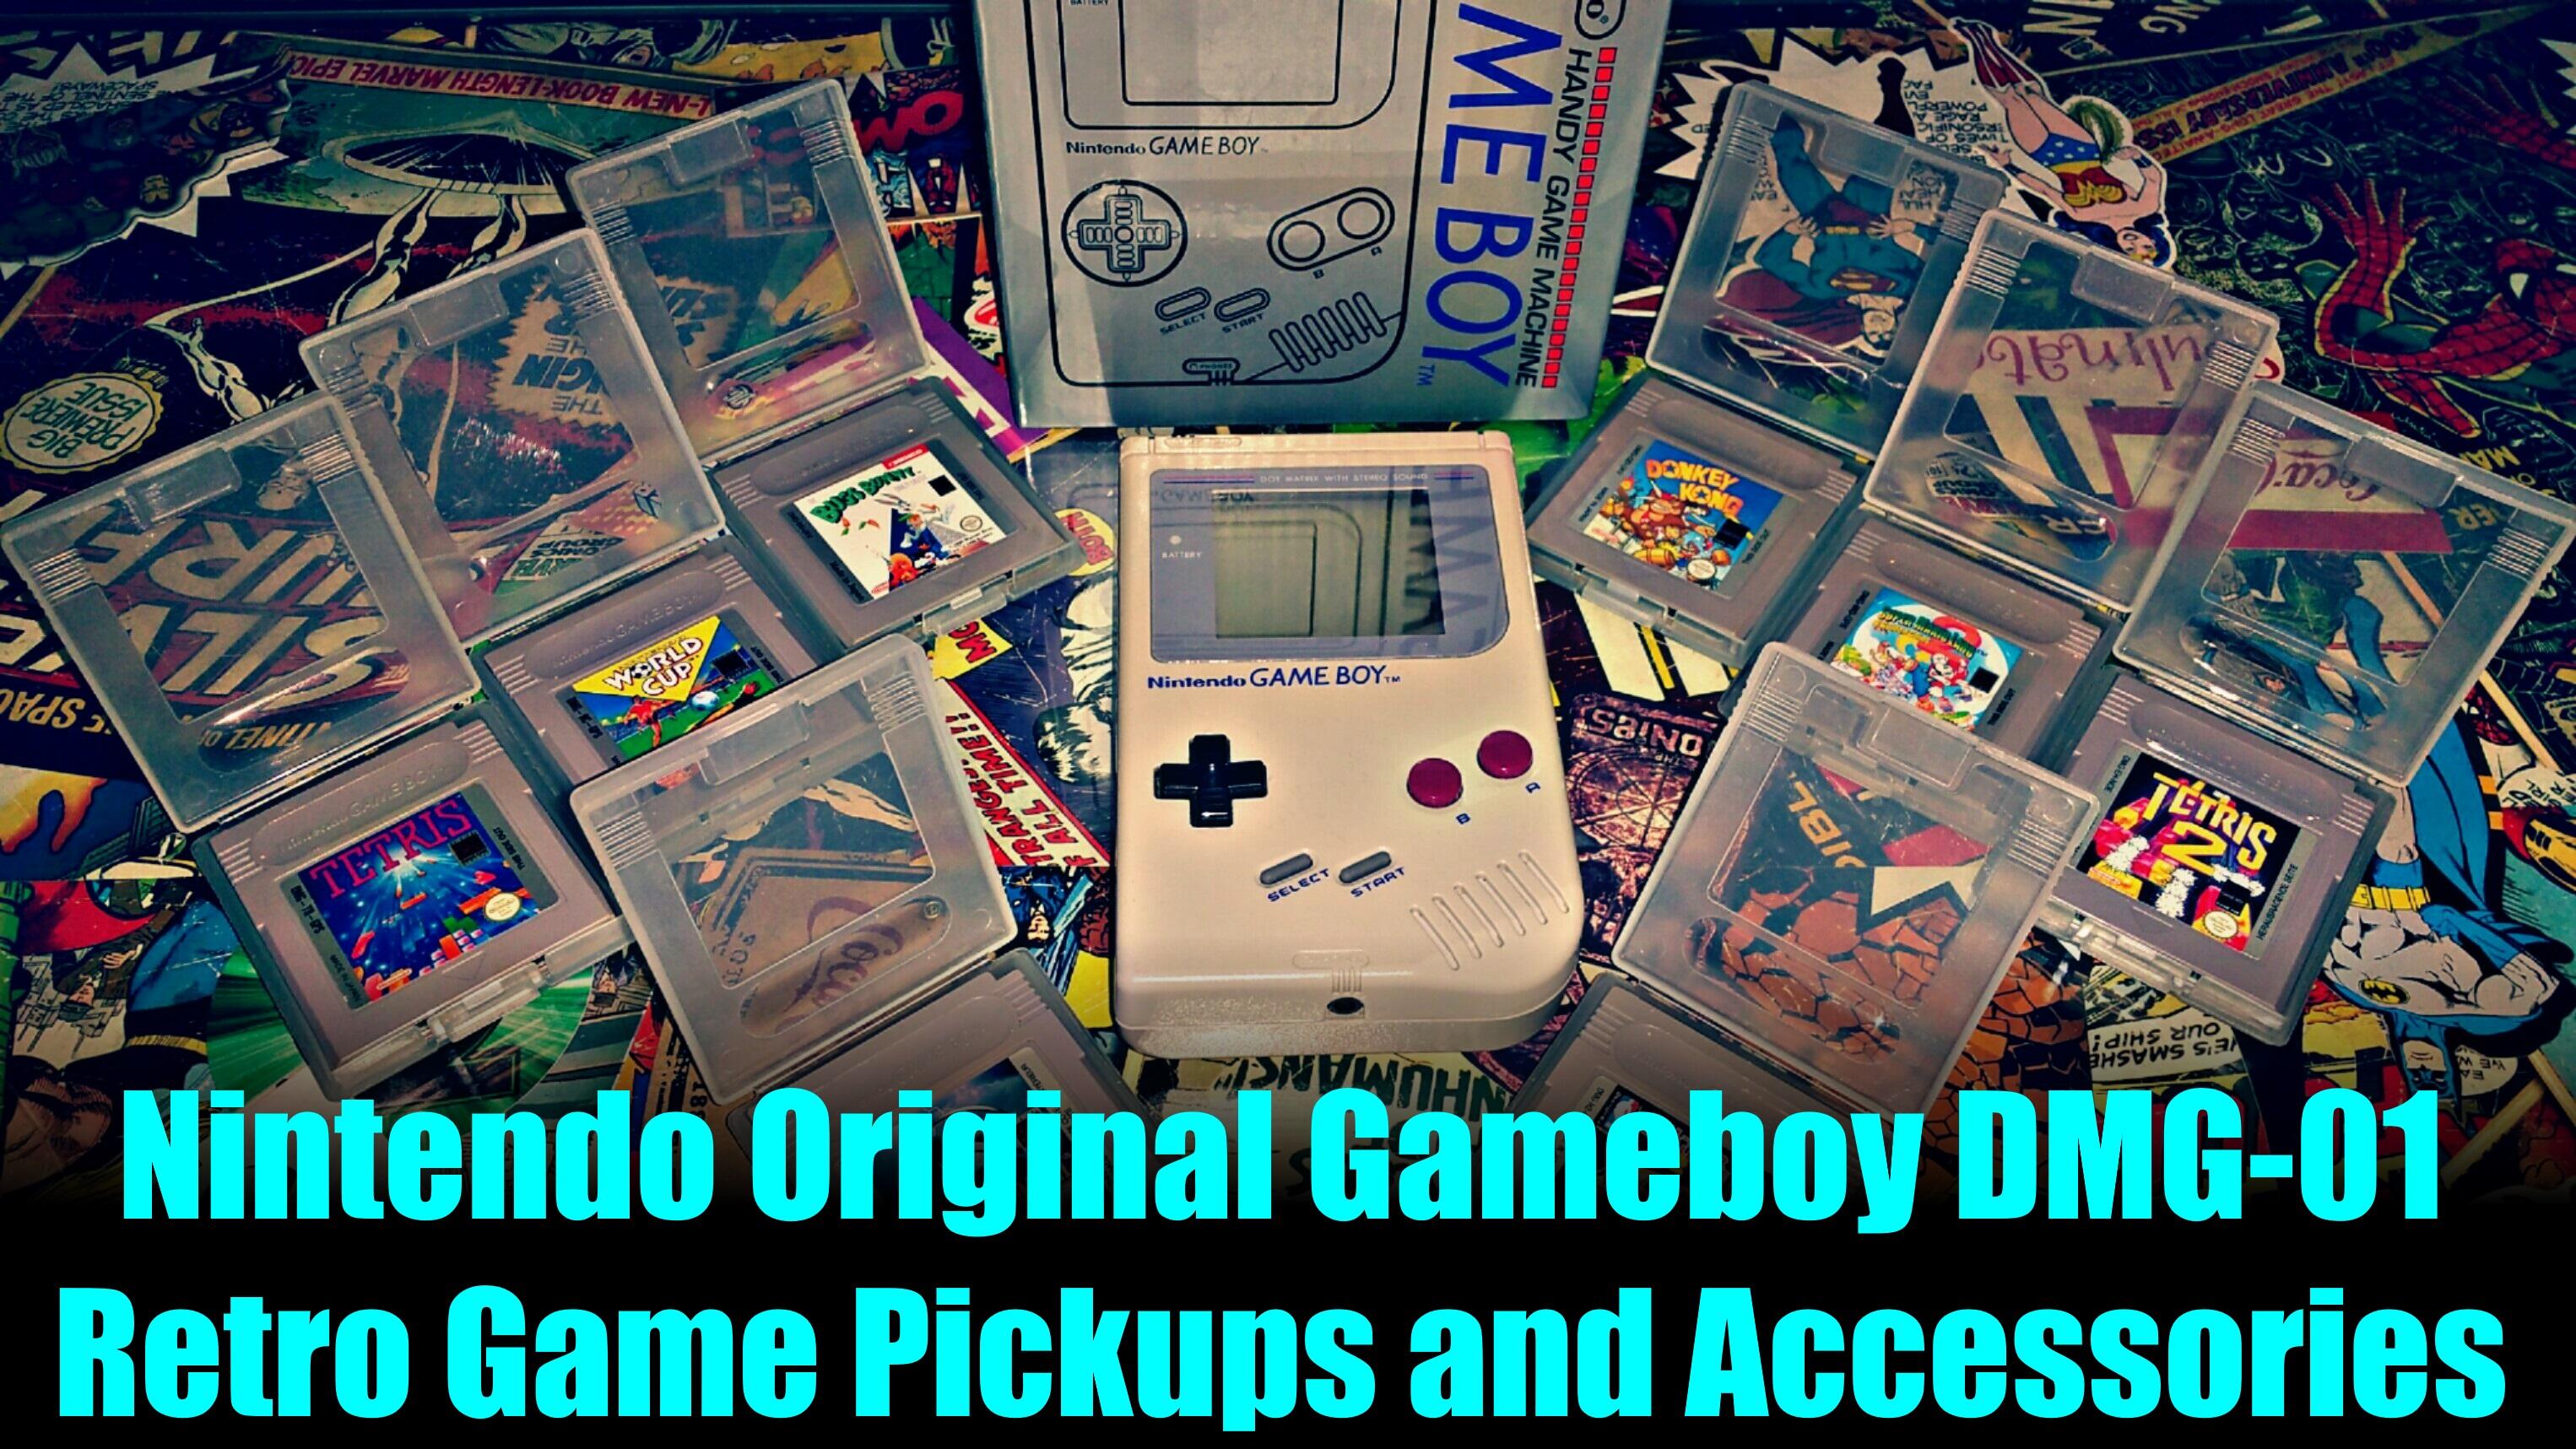 Nintendo Original Gameboy DMG 01 - Retro Game Pickups and Find